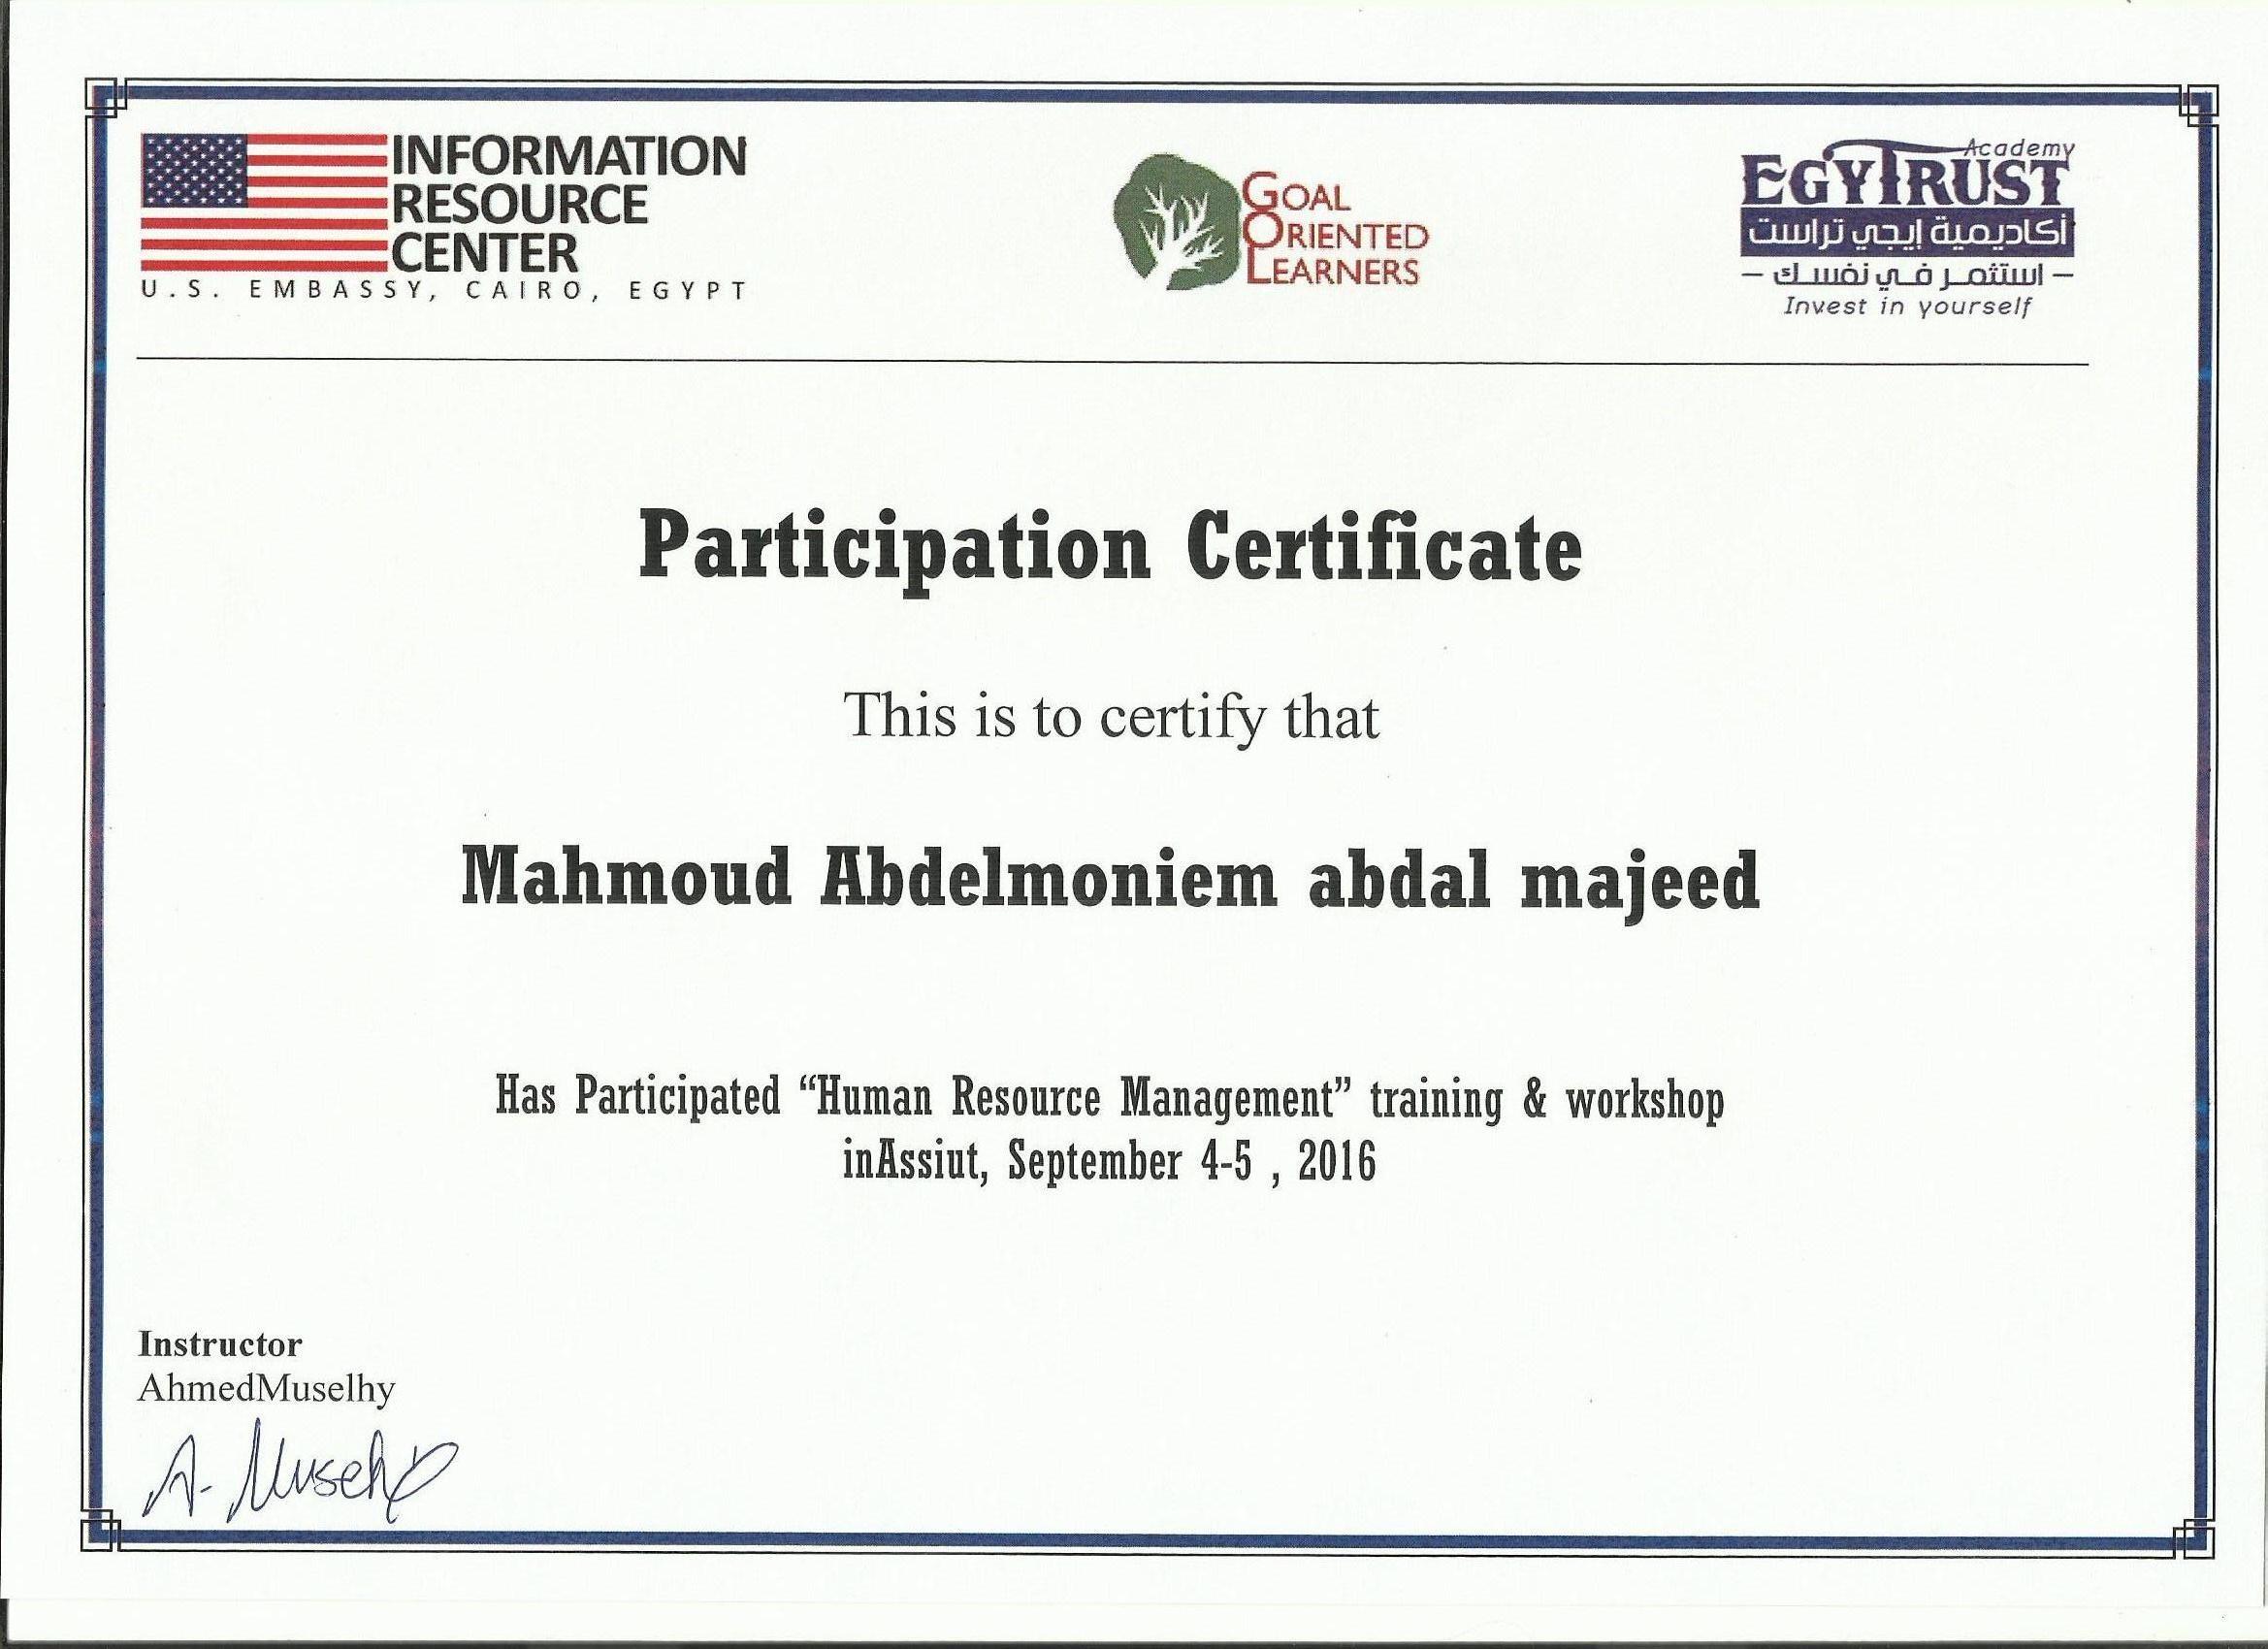 Mahmoud Abdel Moneim Abdul Majeed Mohamed Bayt